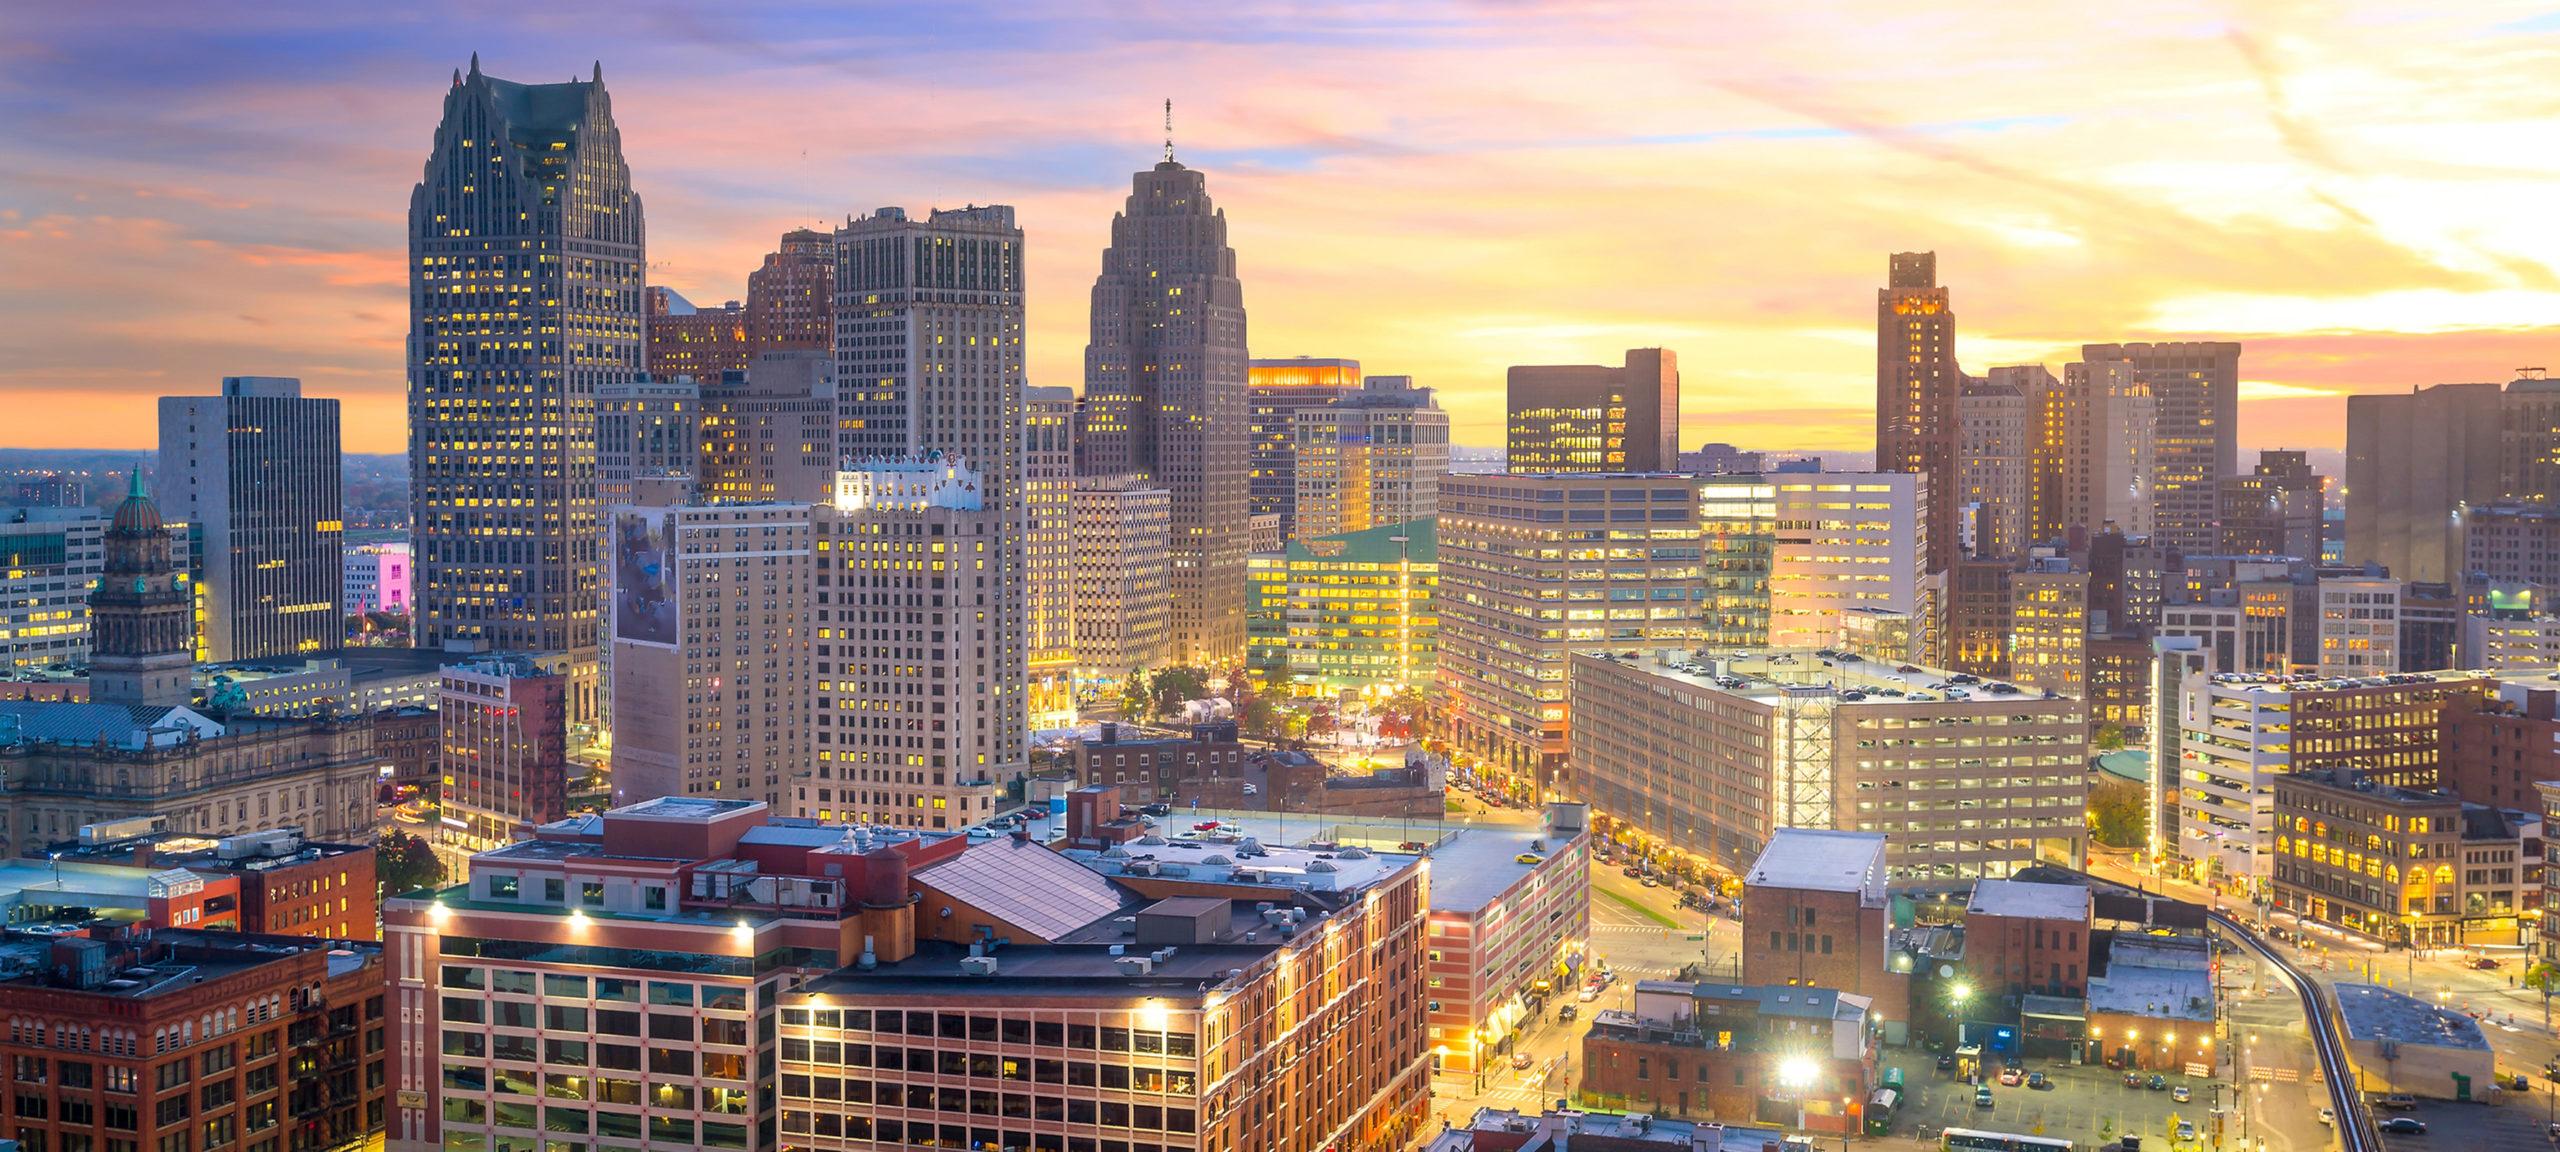 Detroit Skyline. Image credit: Getty Image